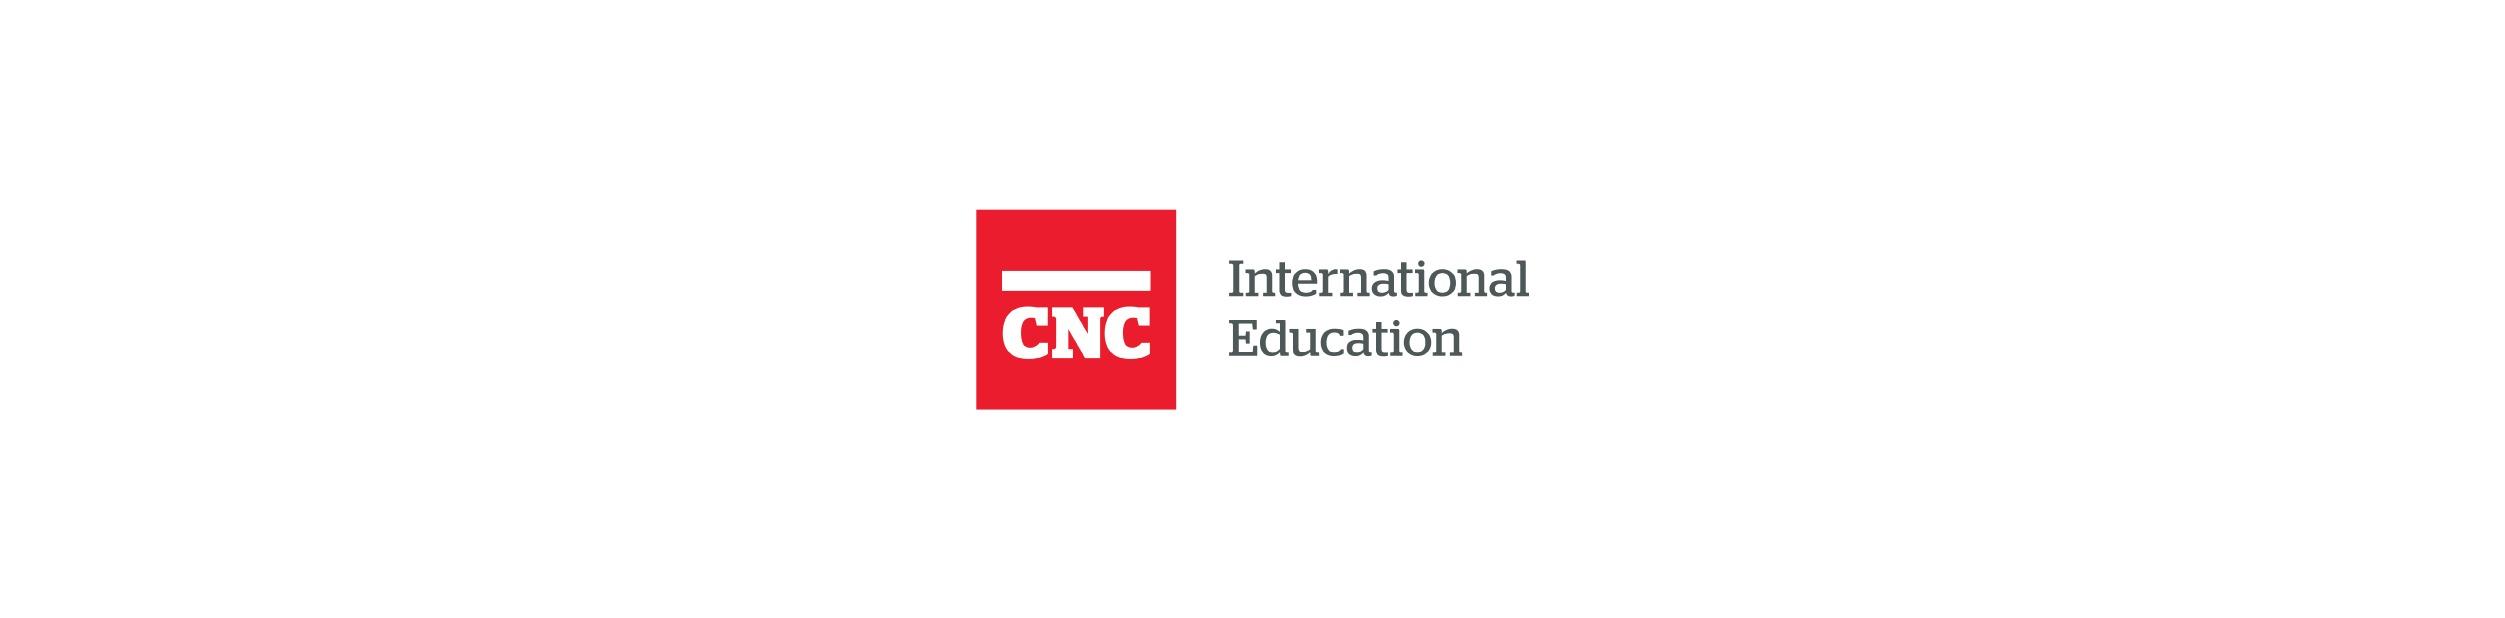 CNC-international